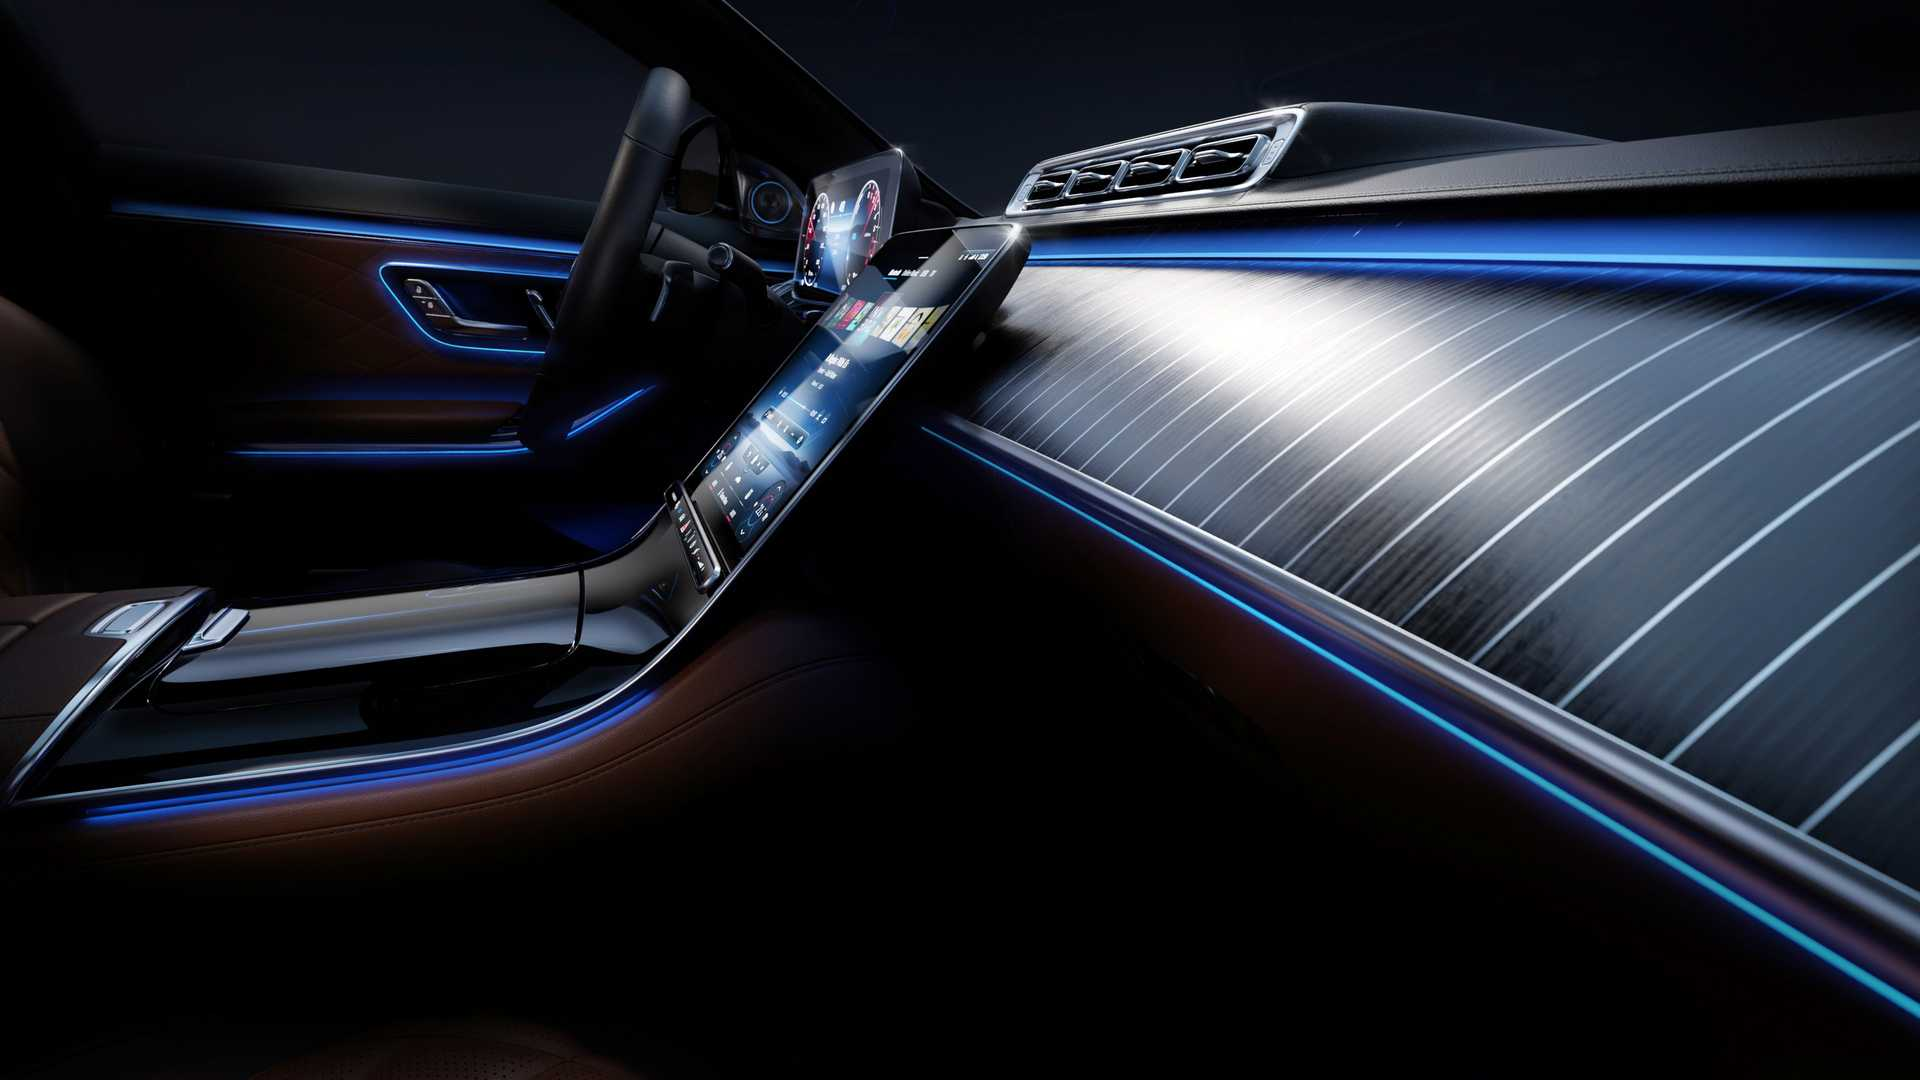 2021-mercedes-benz-s-class-ambient-lighting.jpg